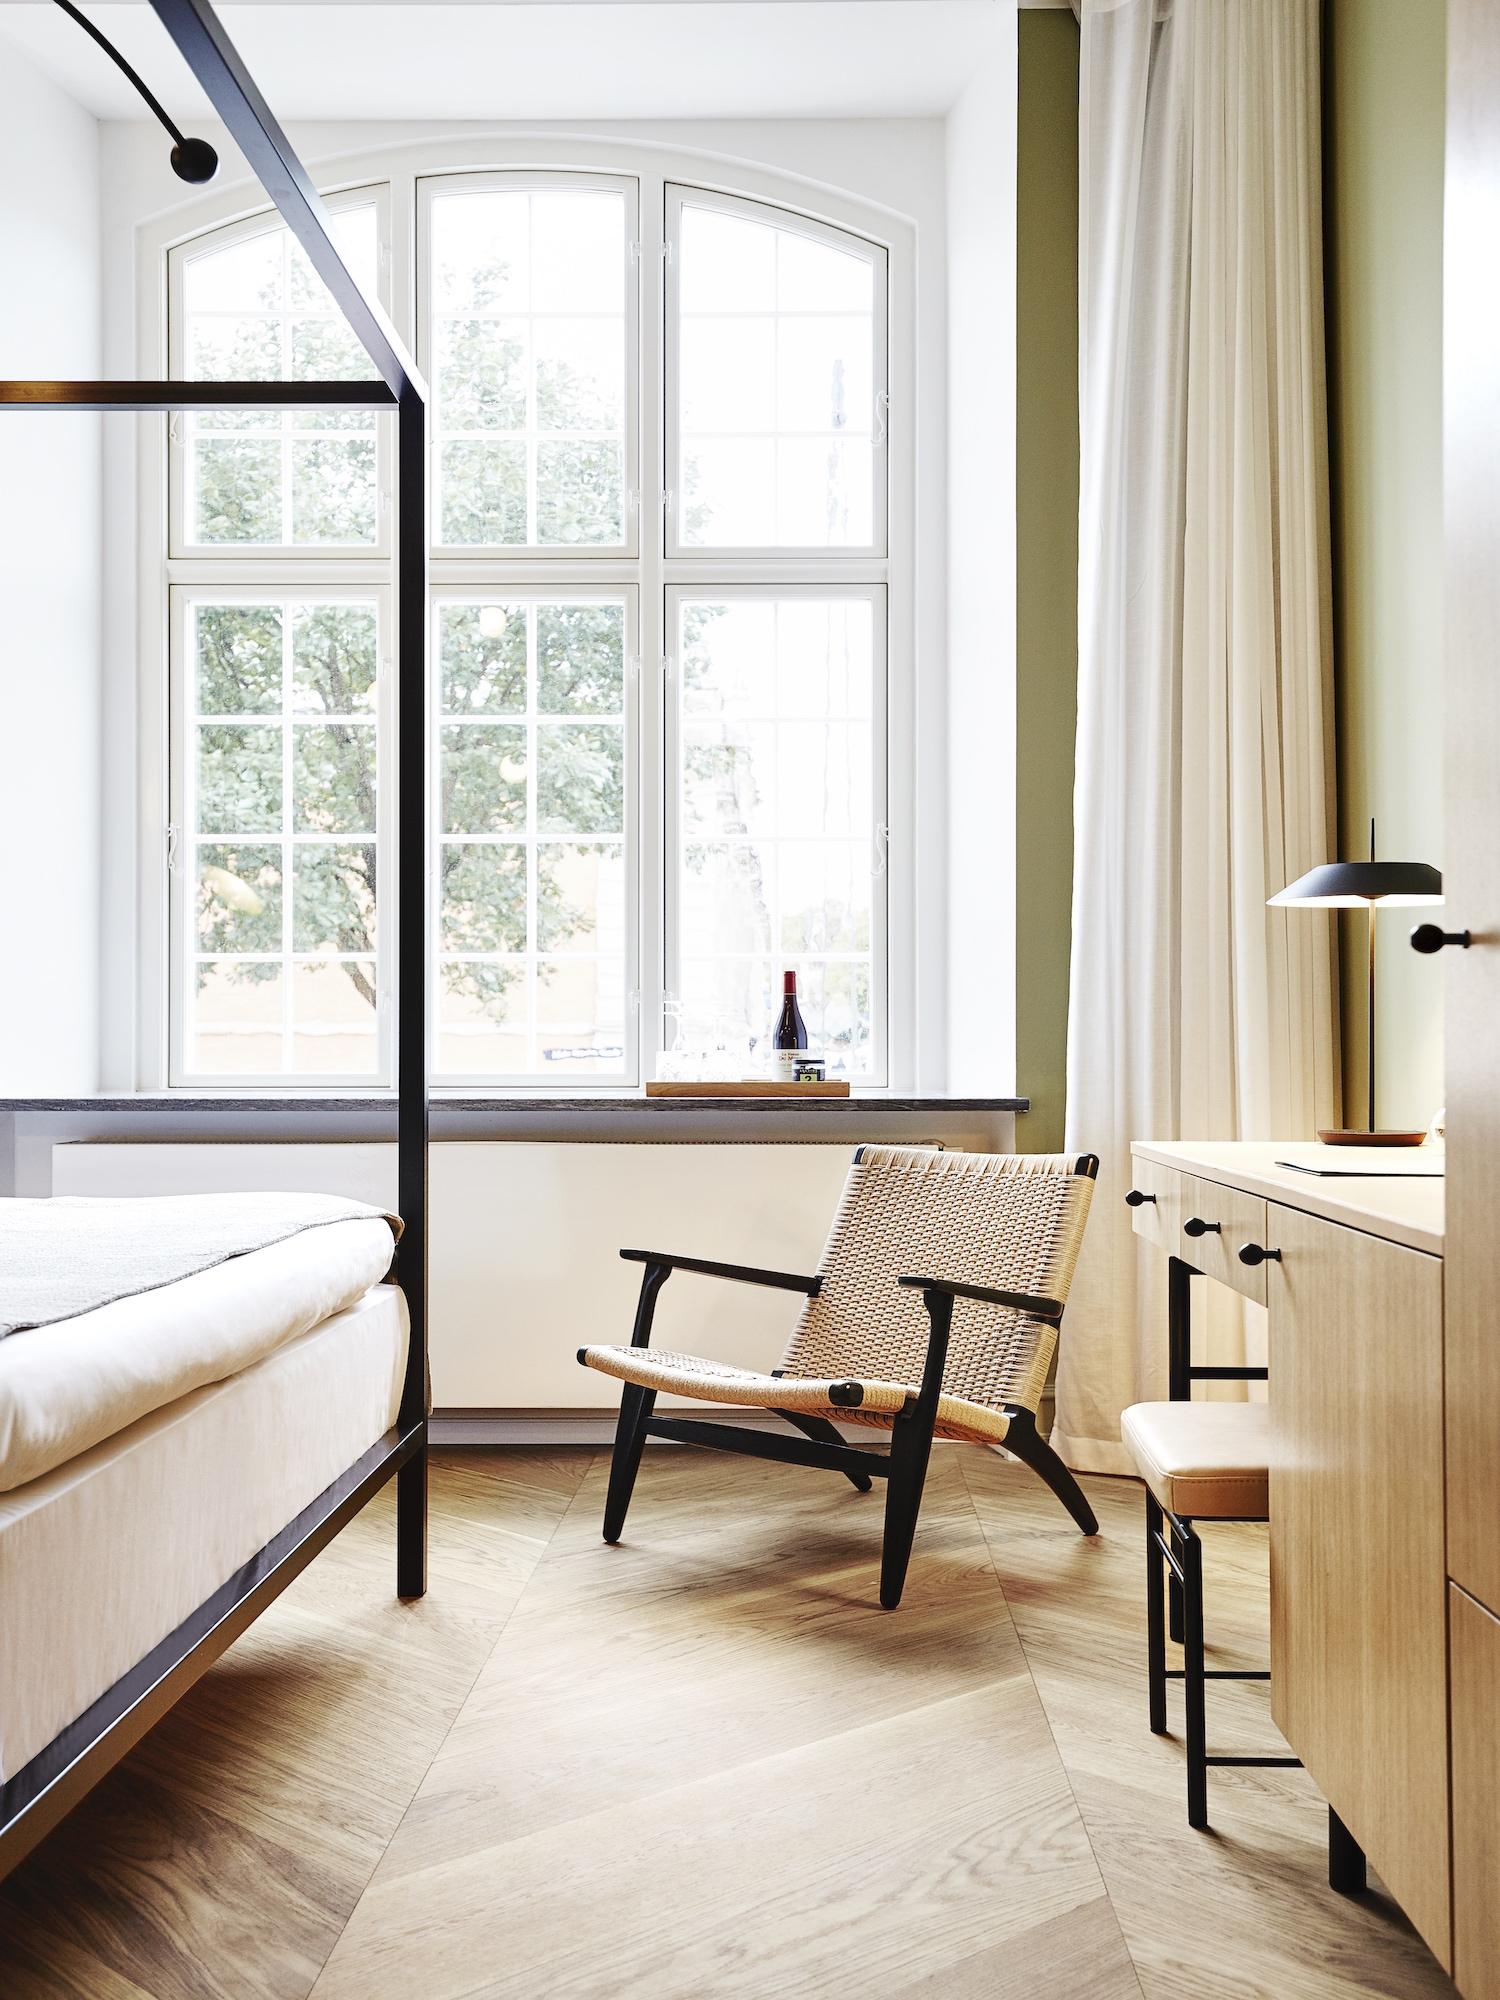 est living wingårdhs nobis hotel 32